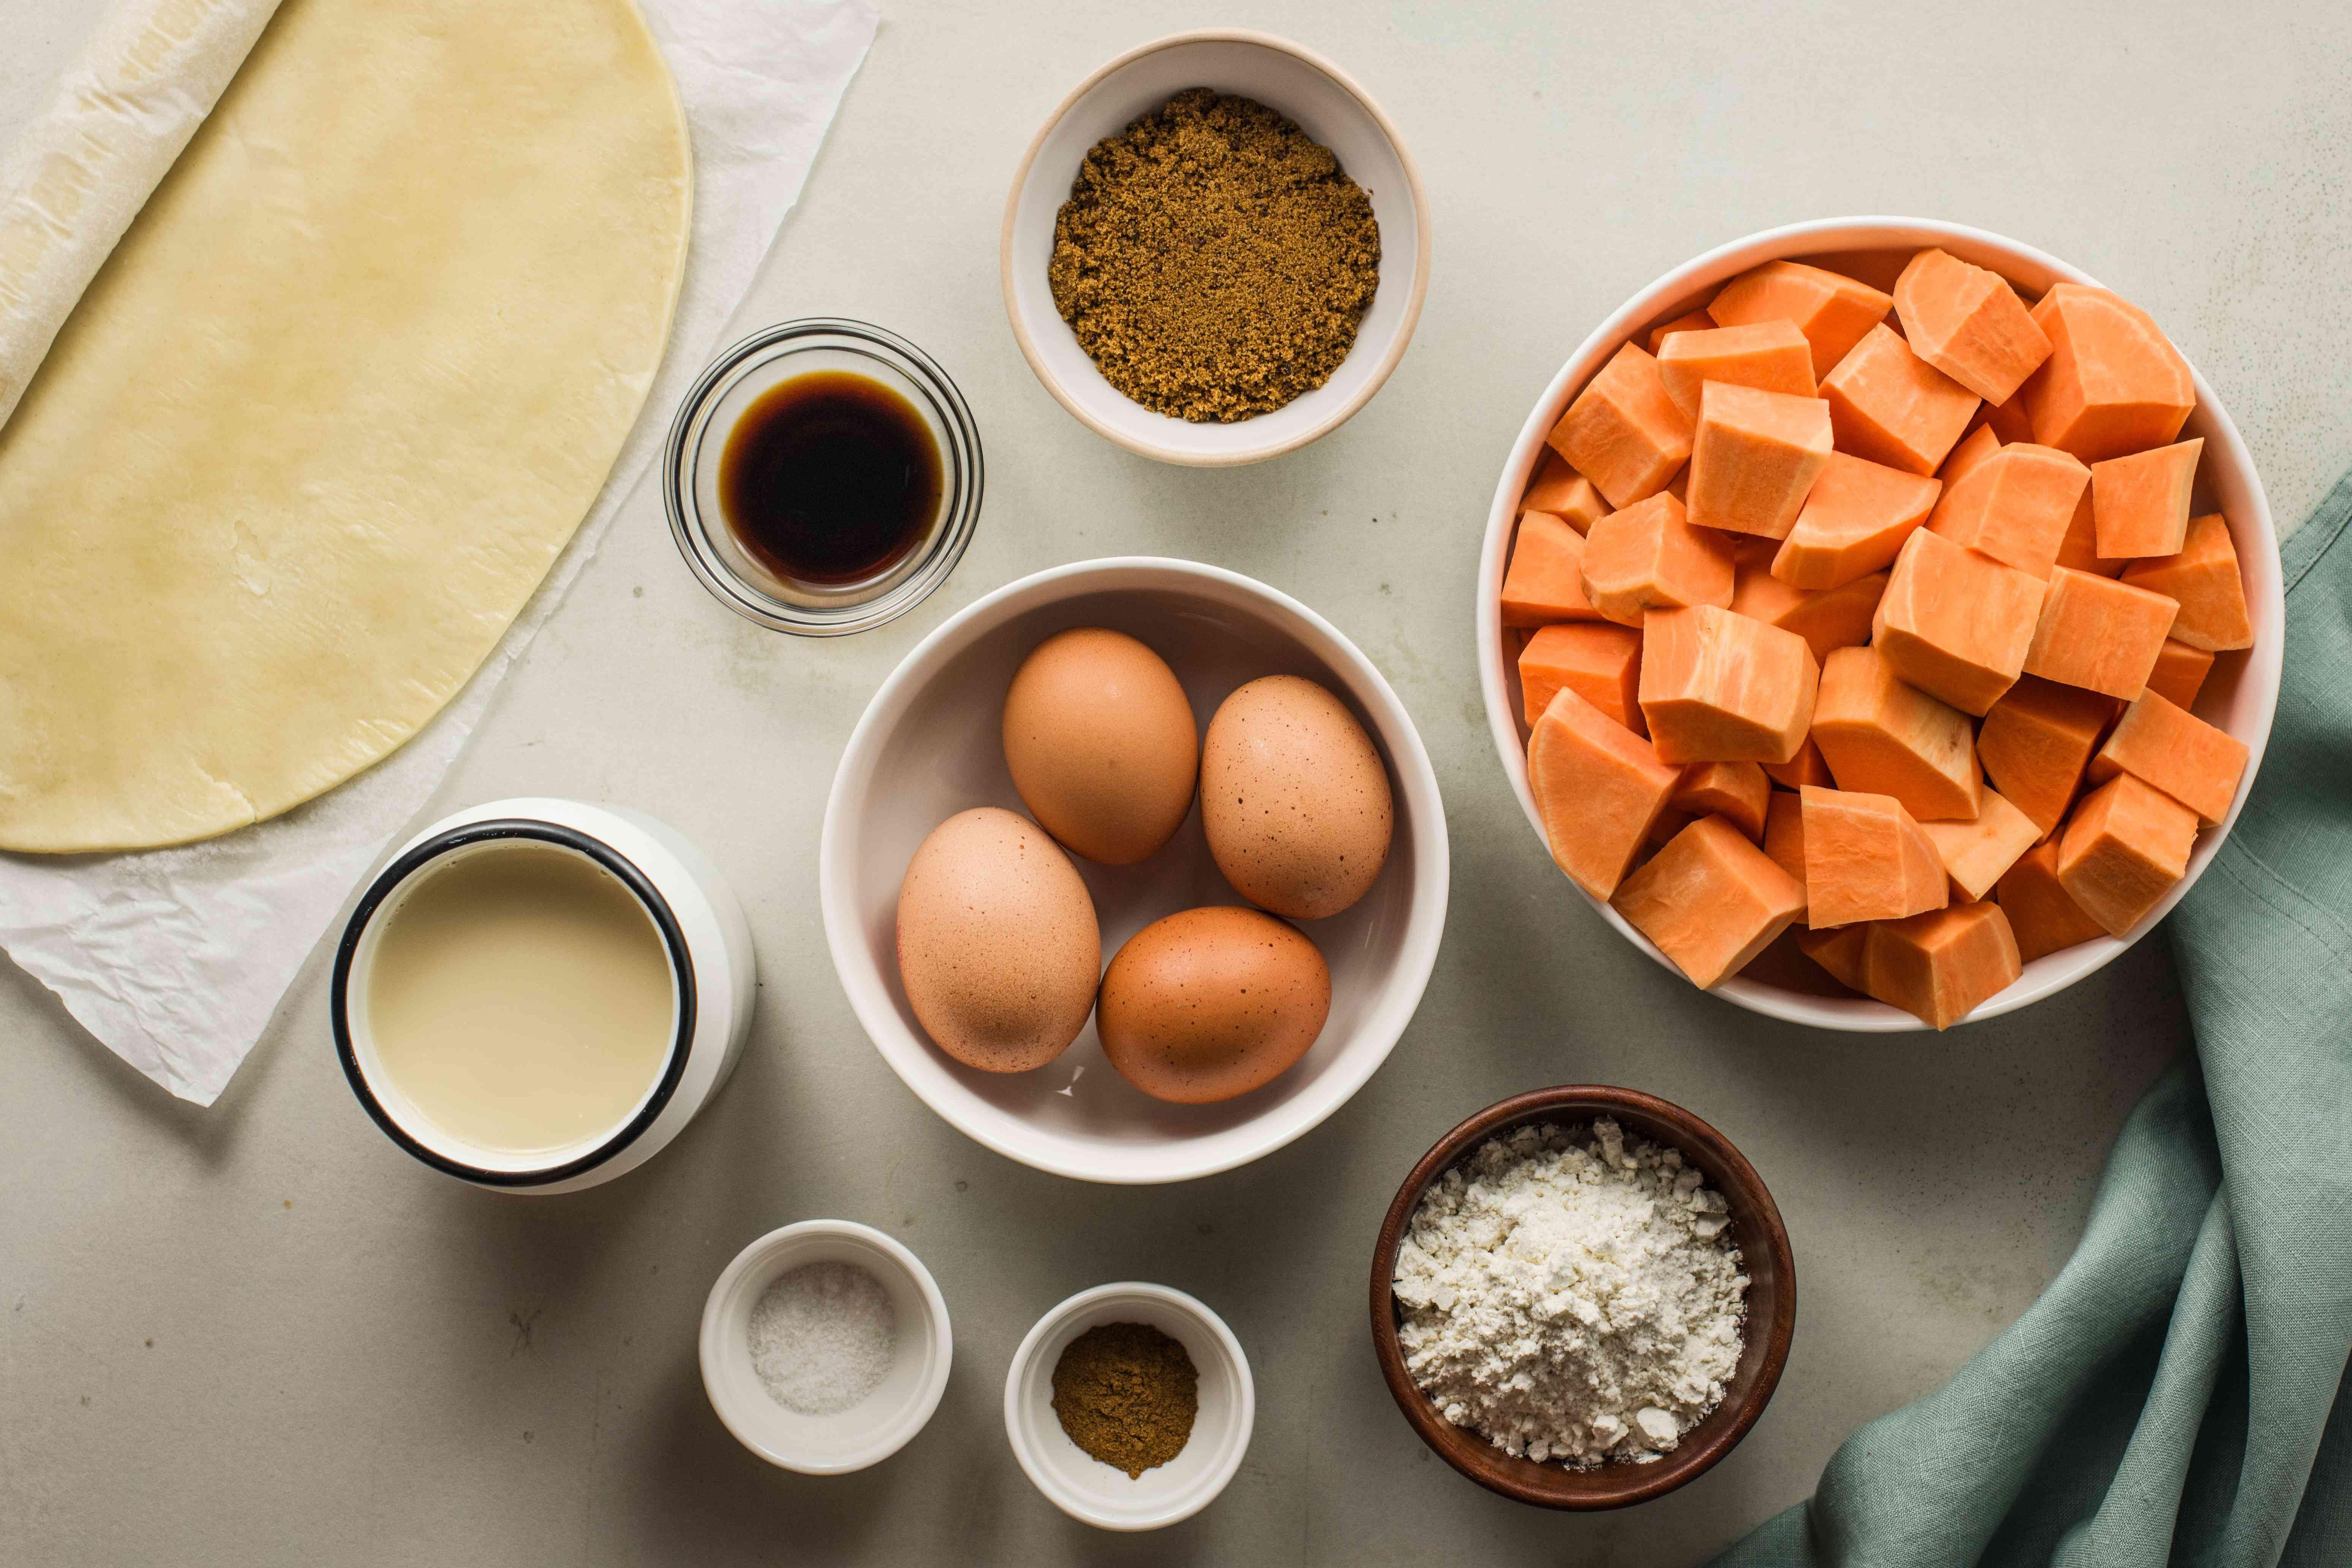 Ingredients for sweet potato pie